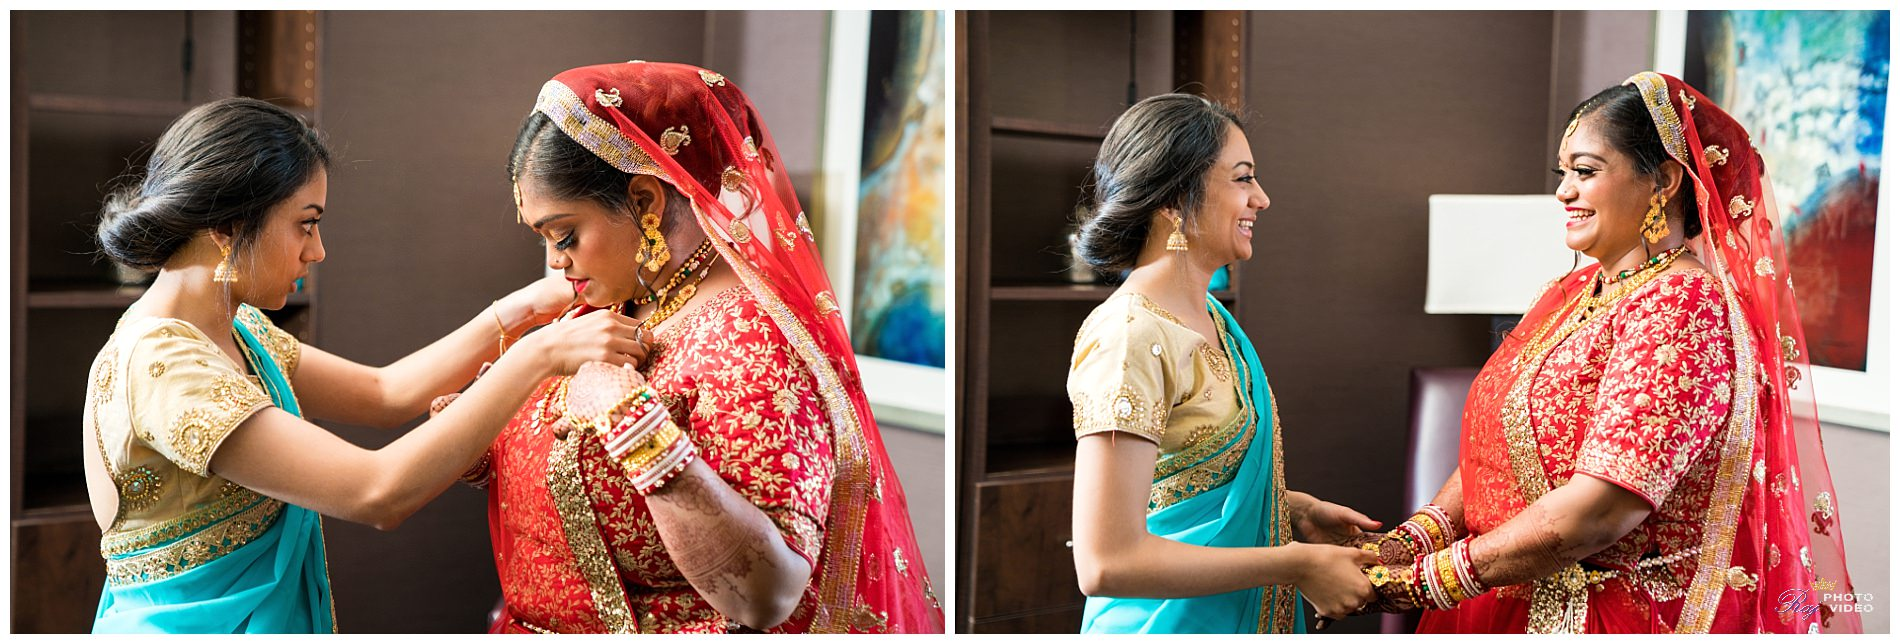 doubletree-by-hilton-hotel-wilmington-de-wedding-krishna-ritesh-26.jpg